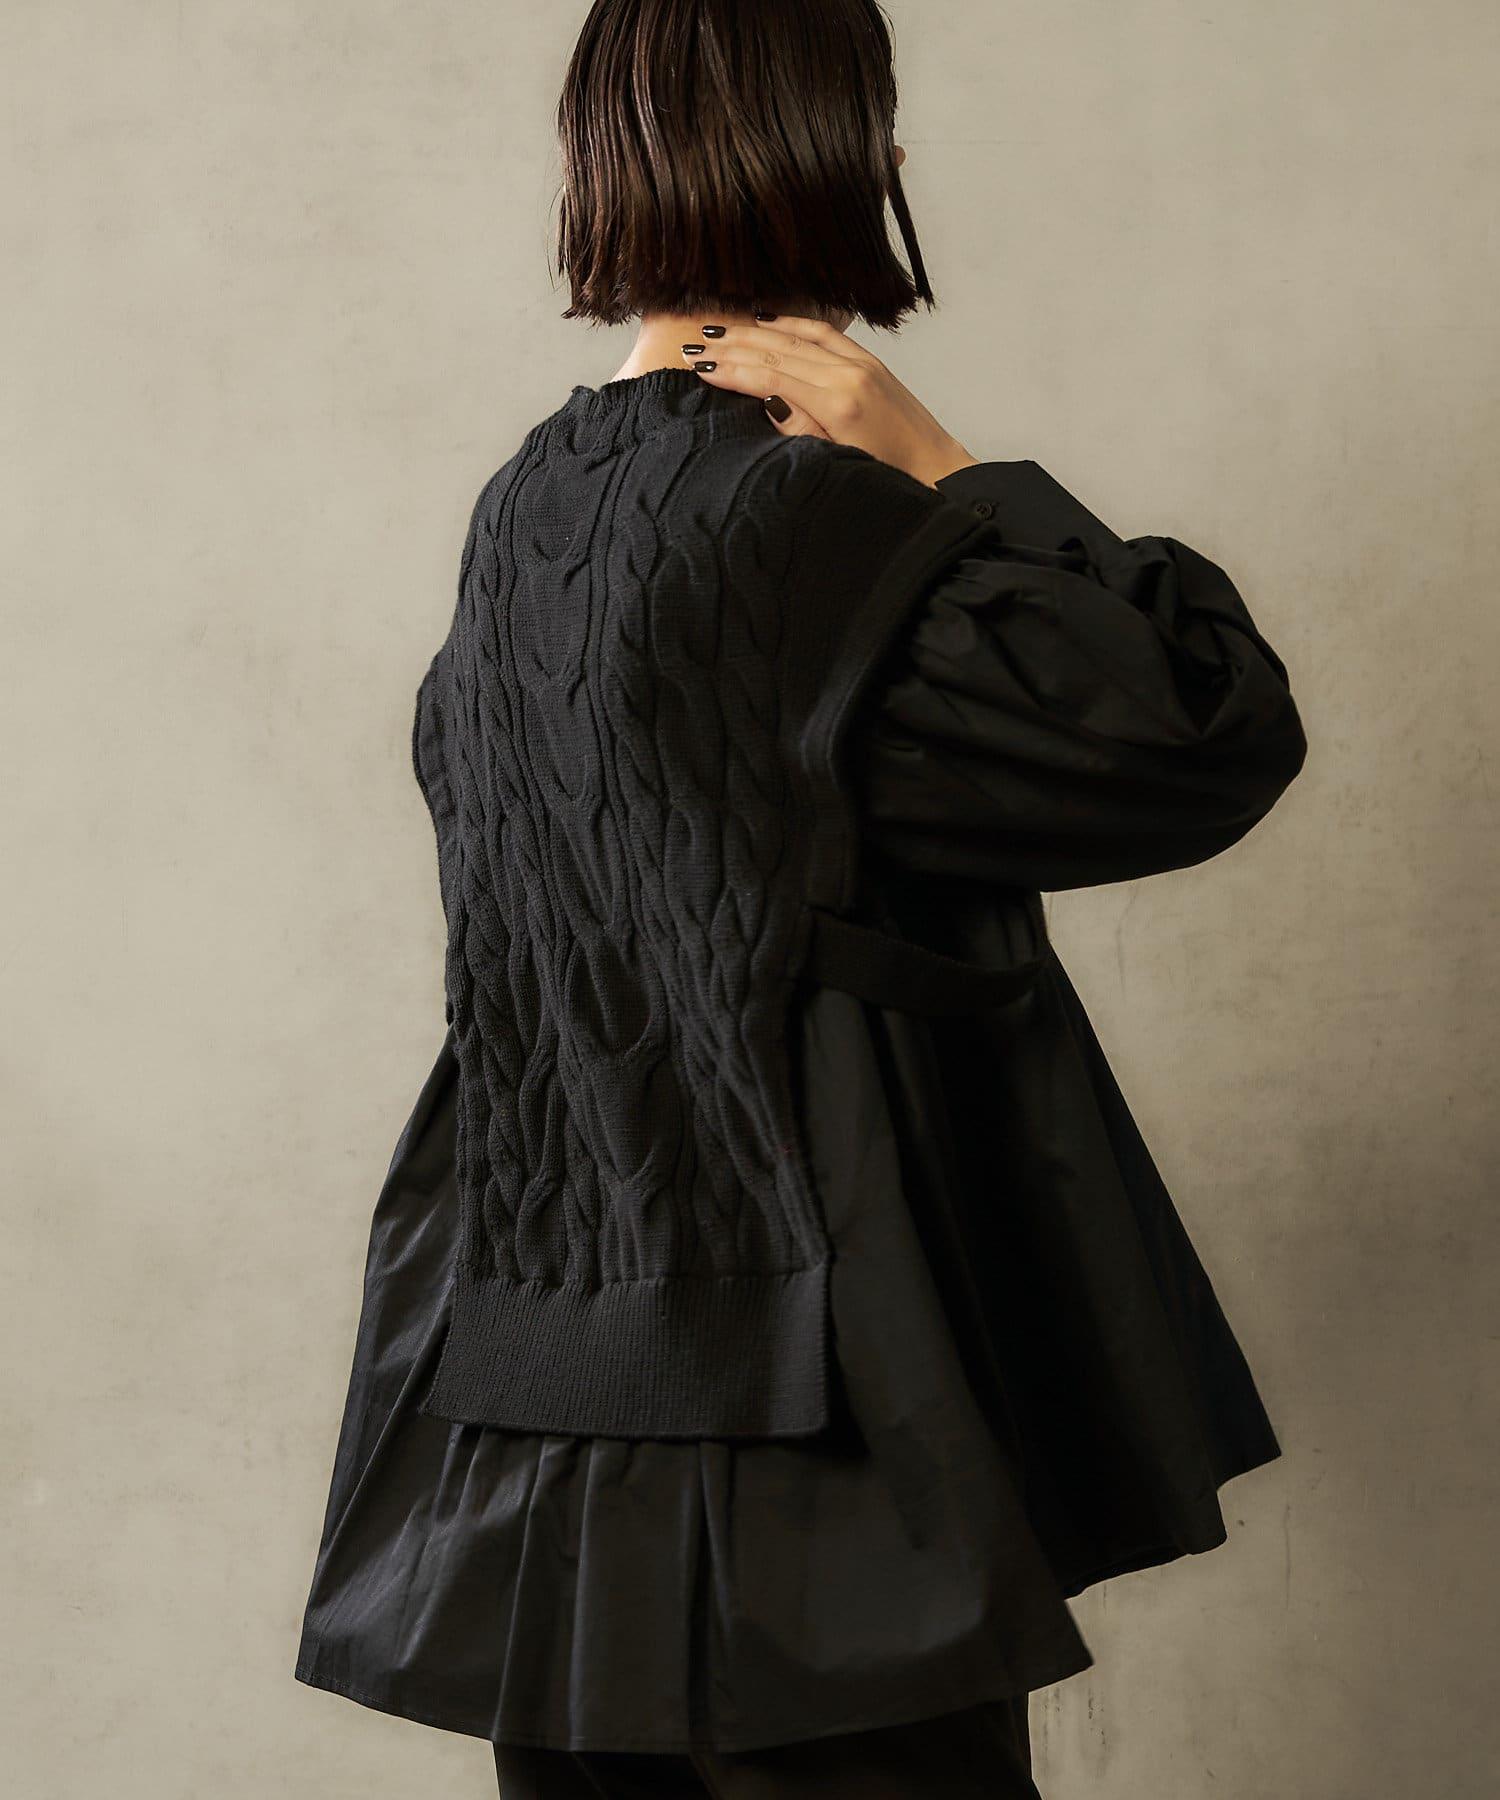 ear PAPILLONNER(イア パピヨネ) 【SUM1 STYLE(スミ スタイル)】 ニットコンビシャツ